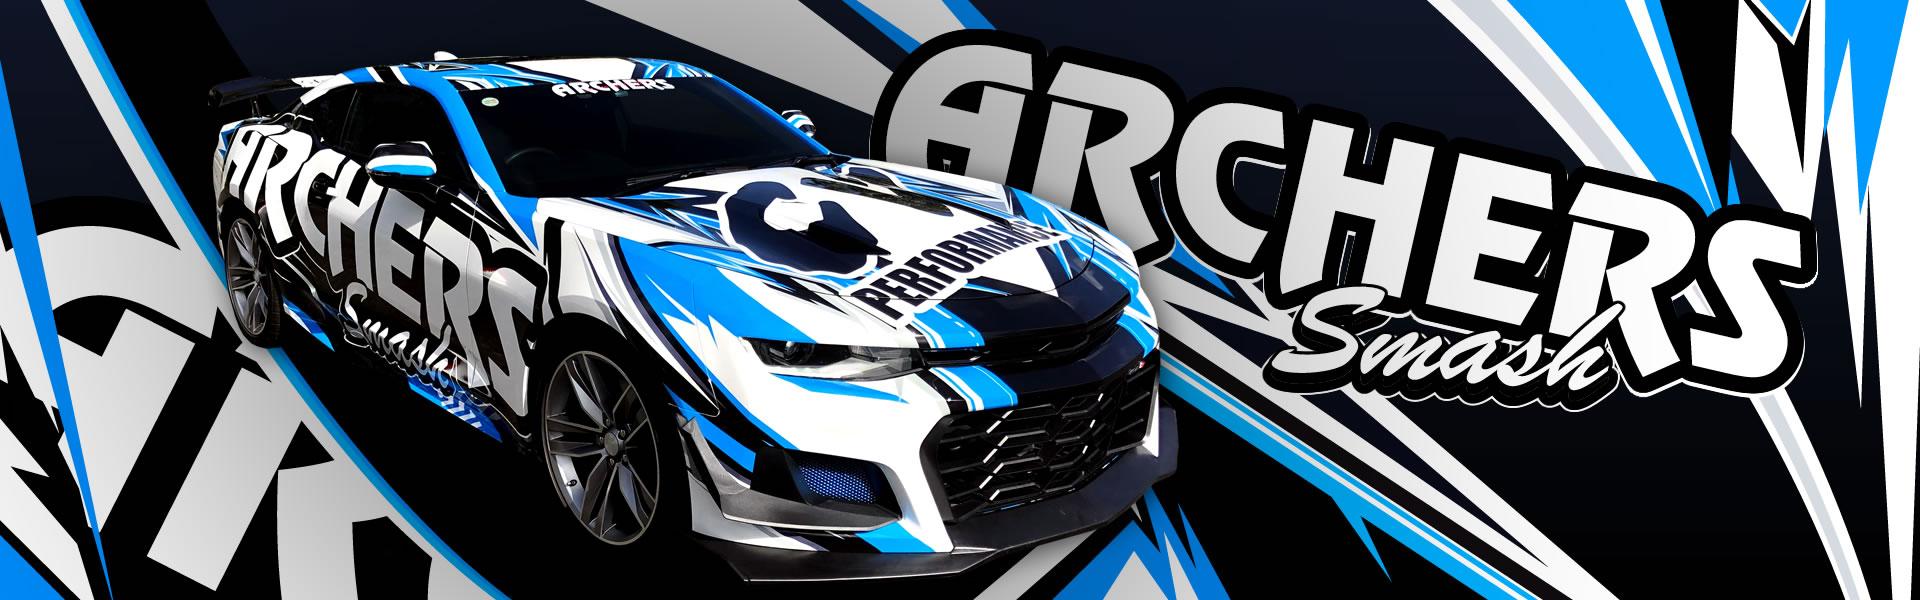 Archers New Camaro